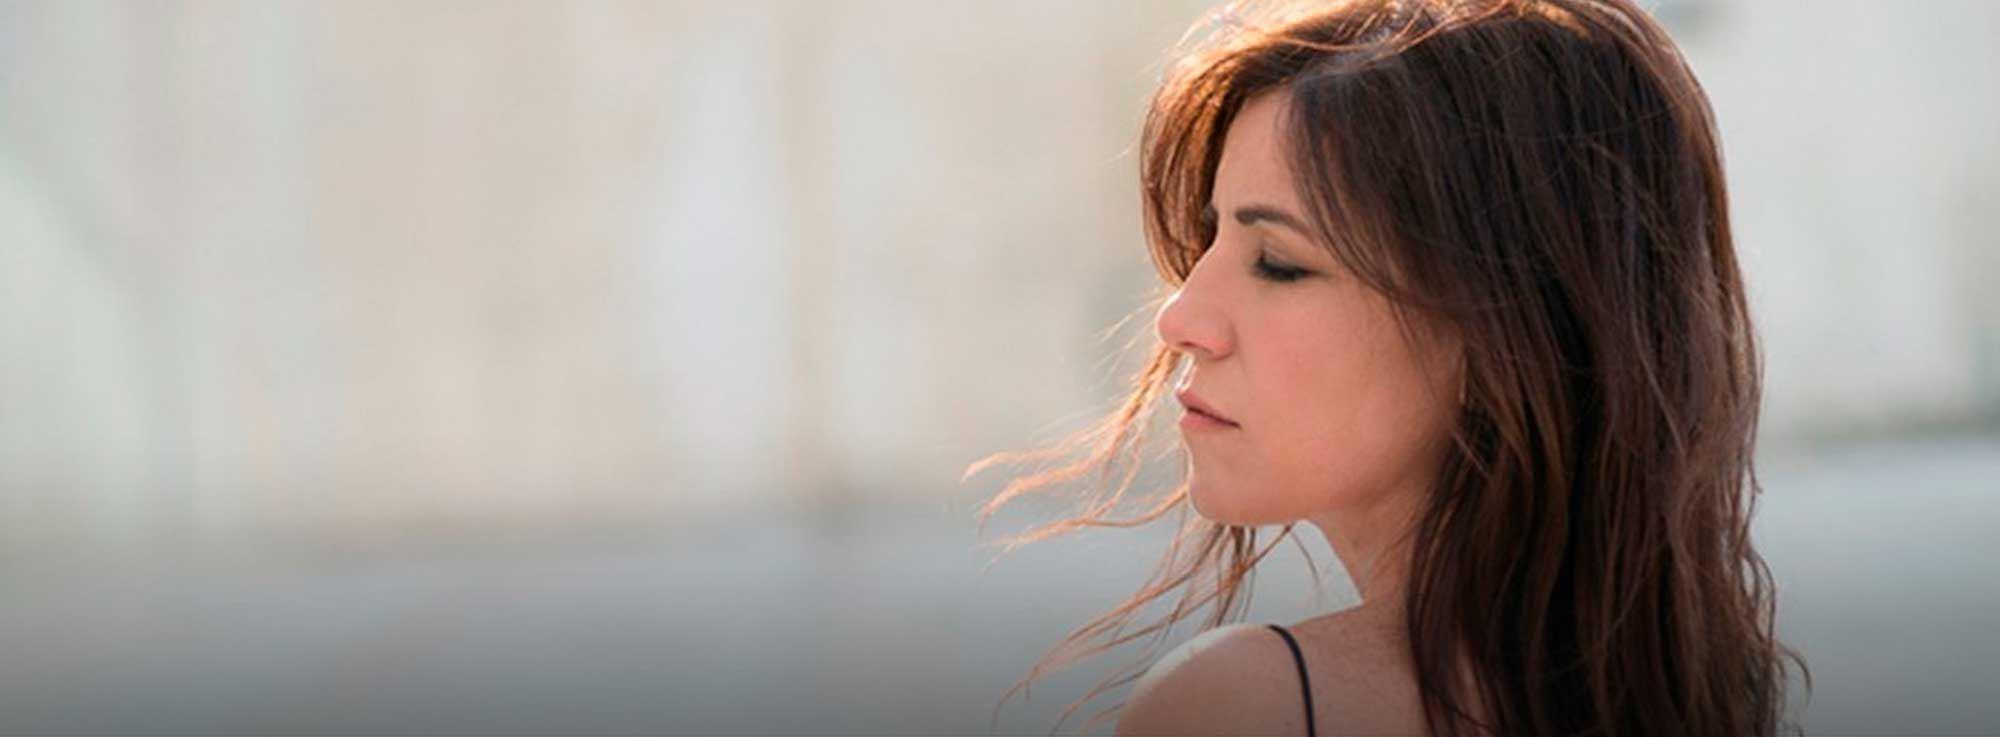 Brindisi: Paola Turci in concerto